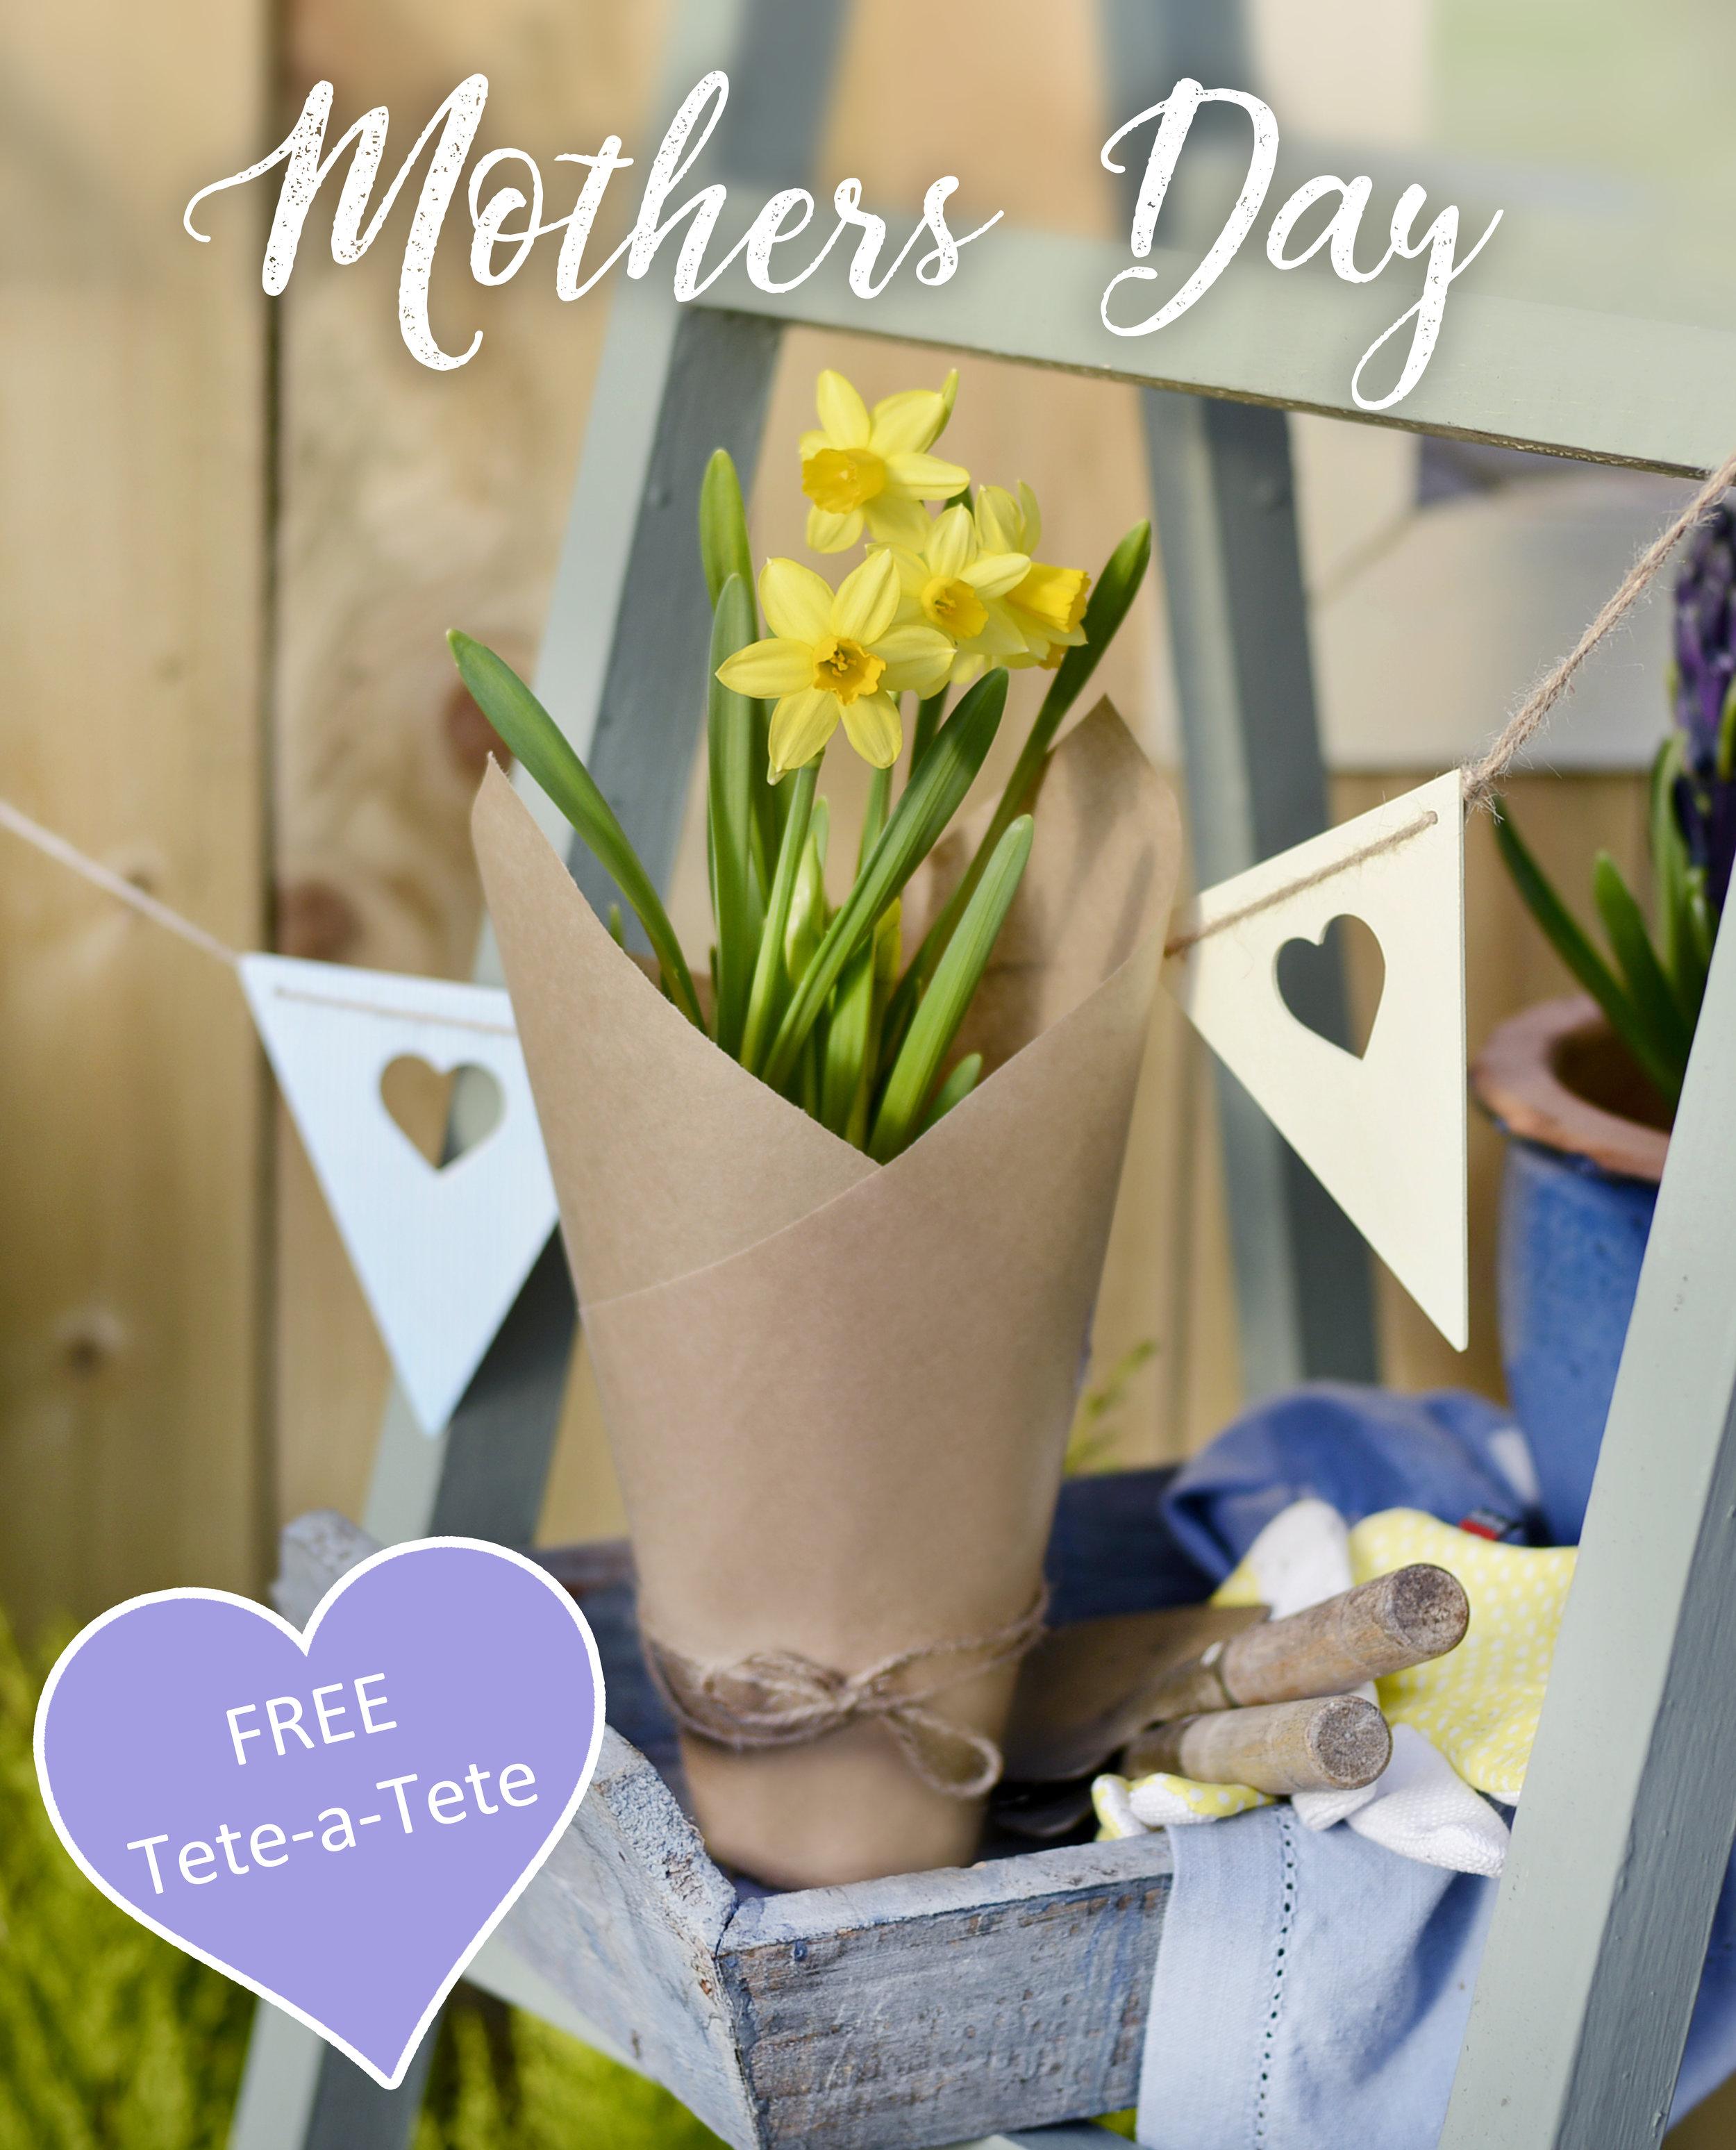 mothersday_free teteatete_WEB.jpg